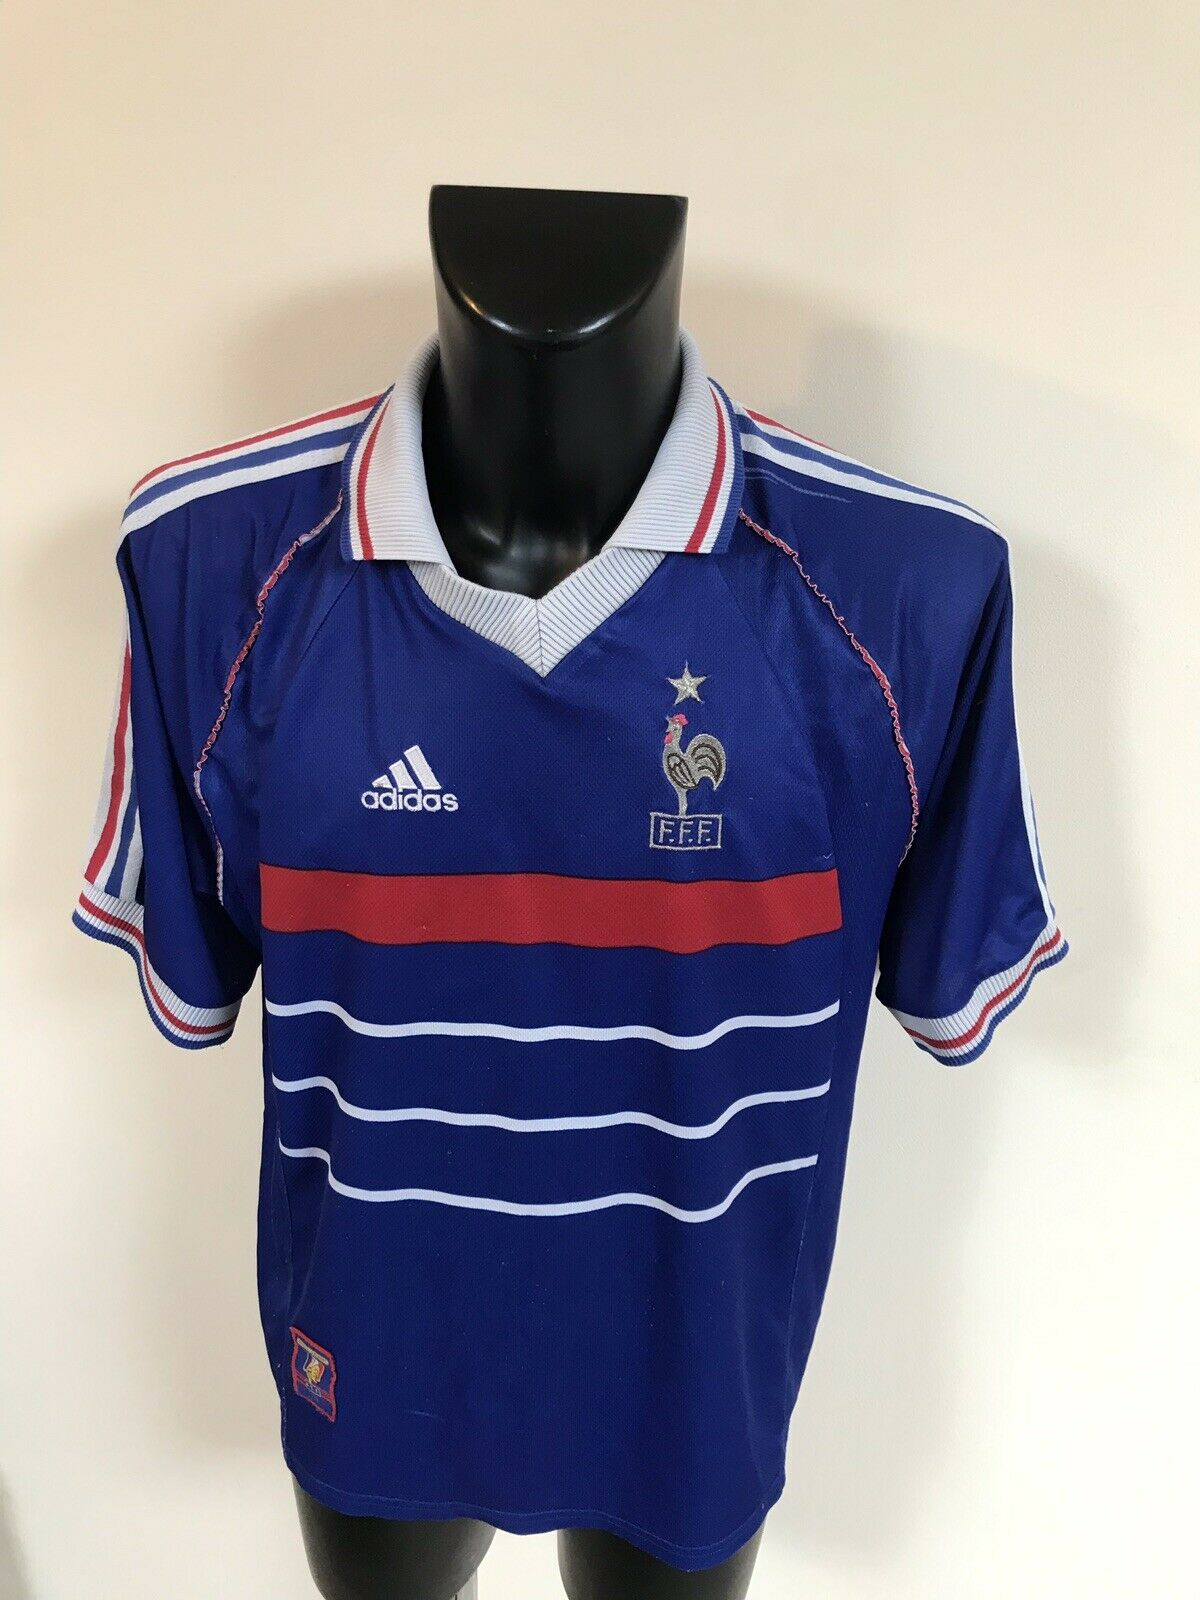 Maillot Foot Ancien Equipe De France 98 Diuominiione XL